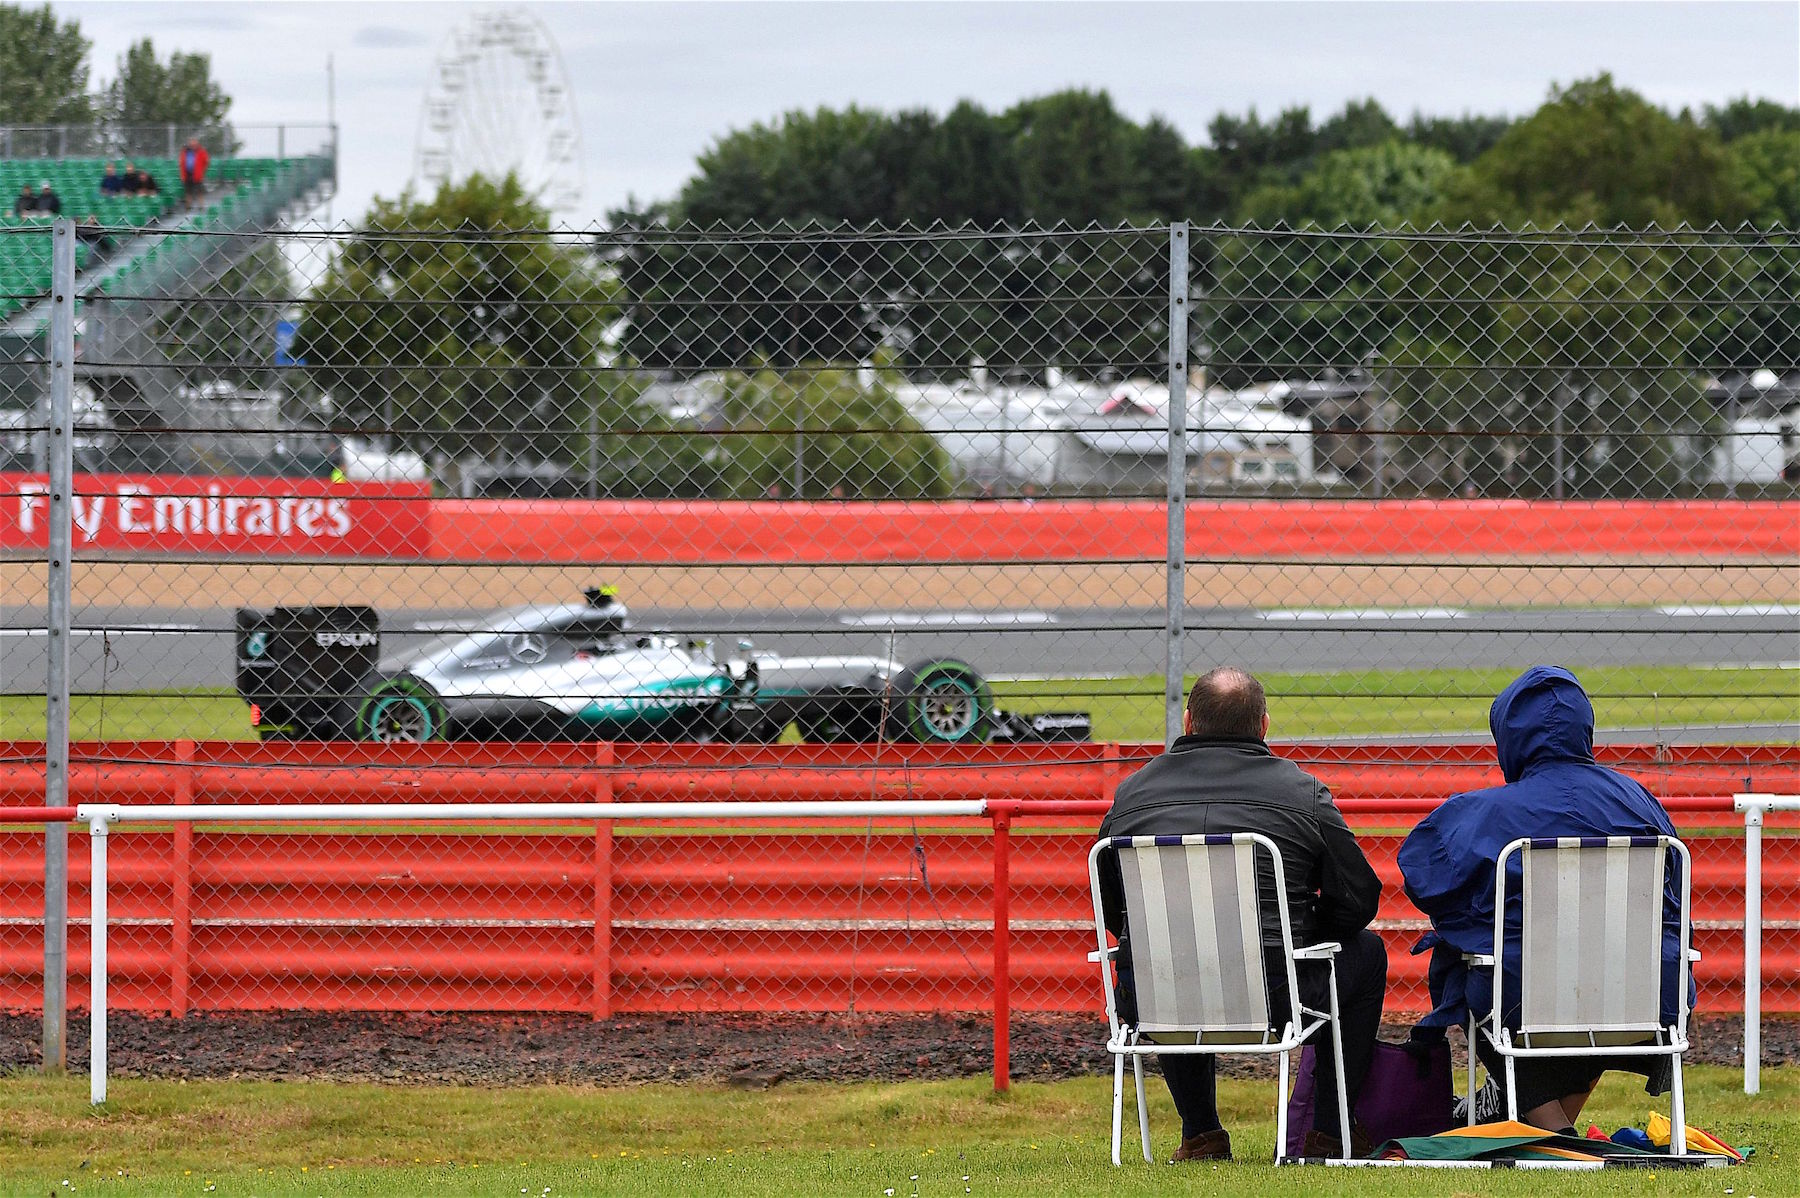 Salracing | British Grand Prix Fans